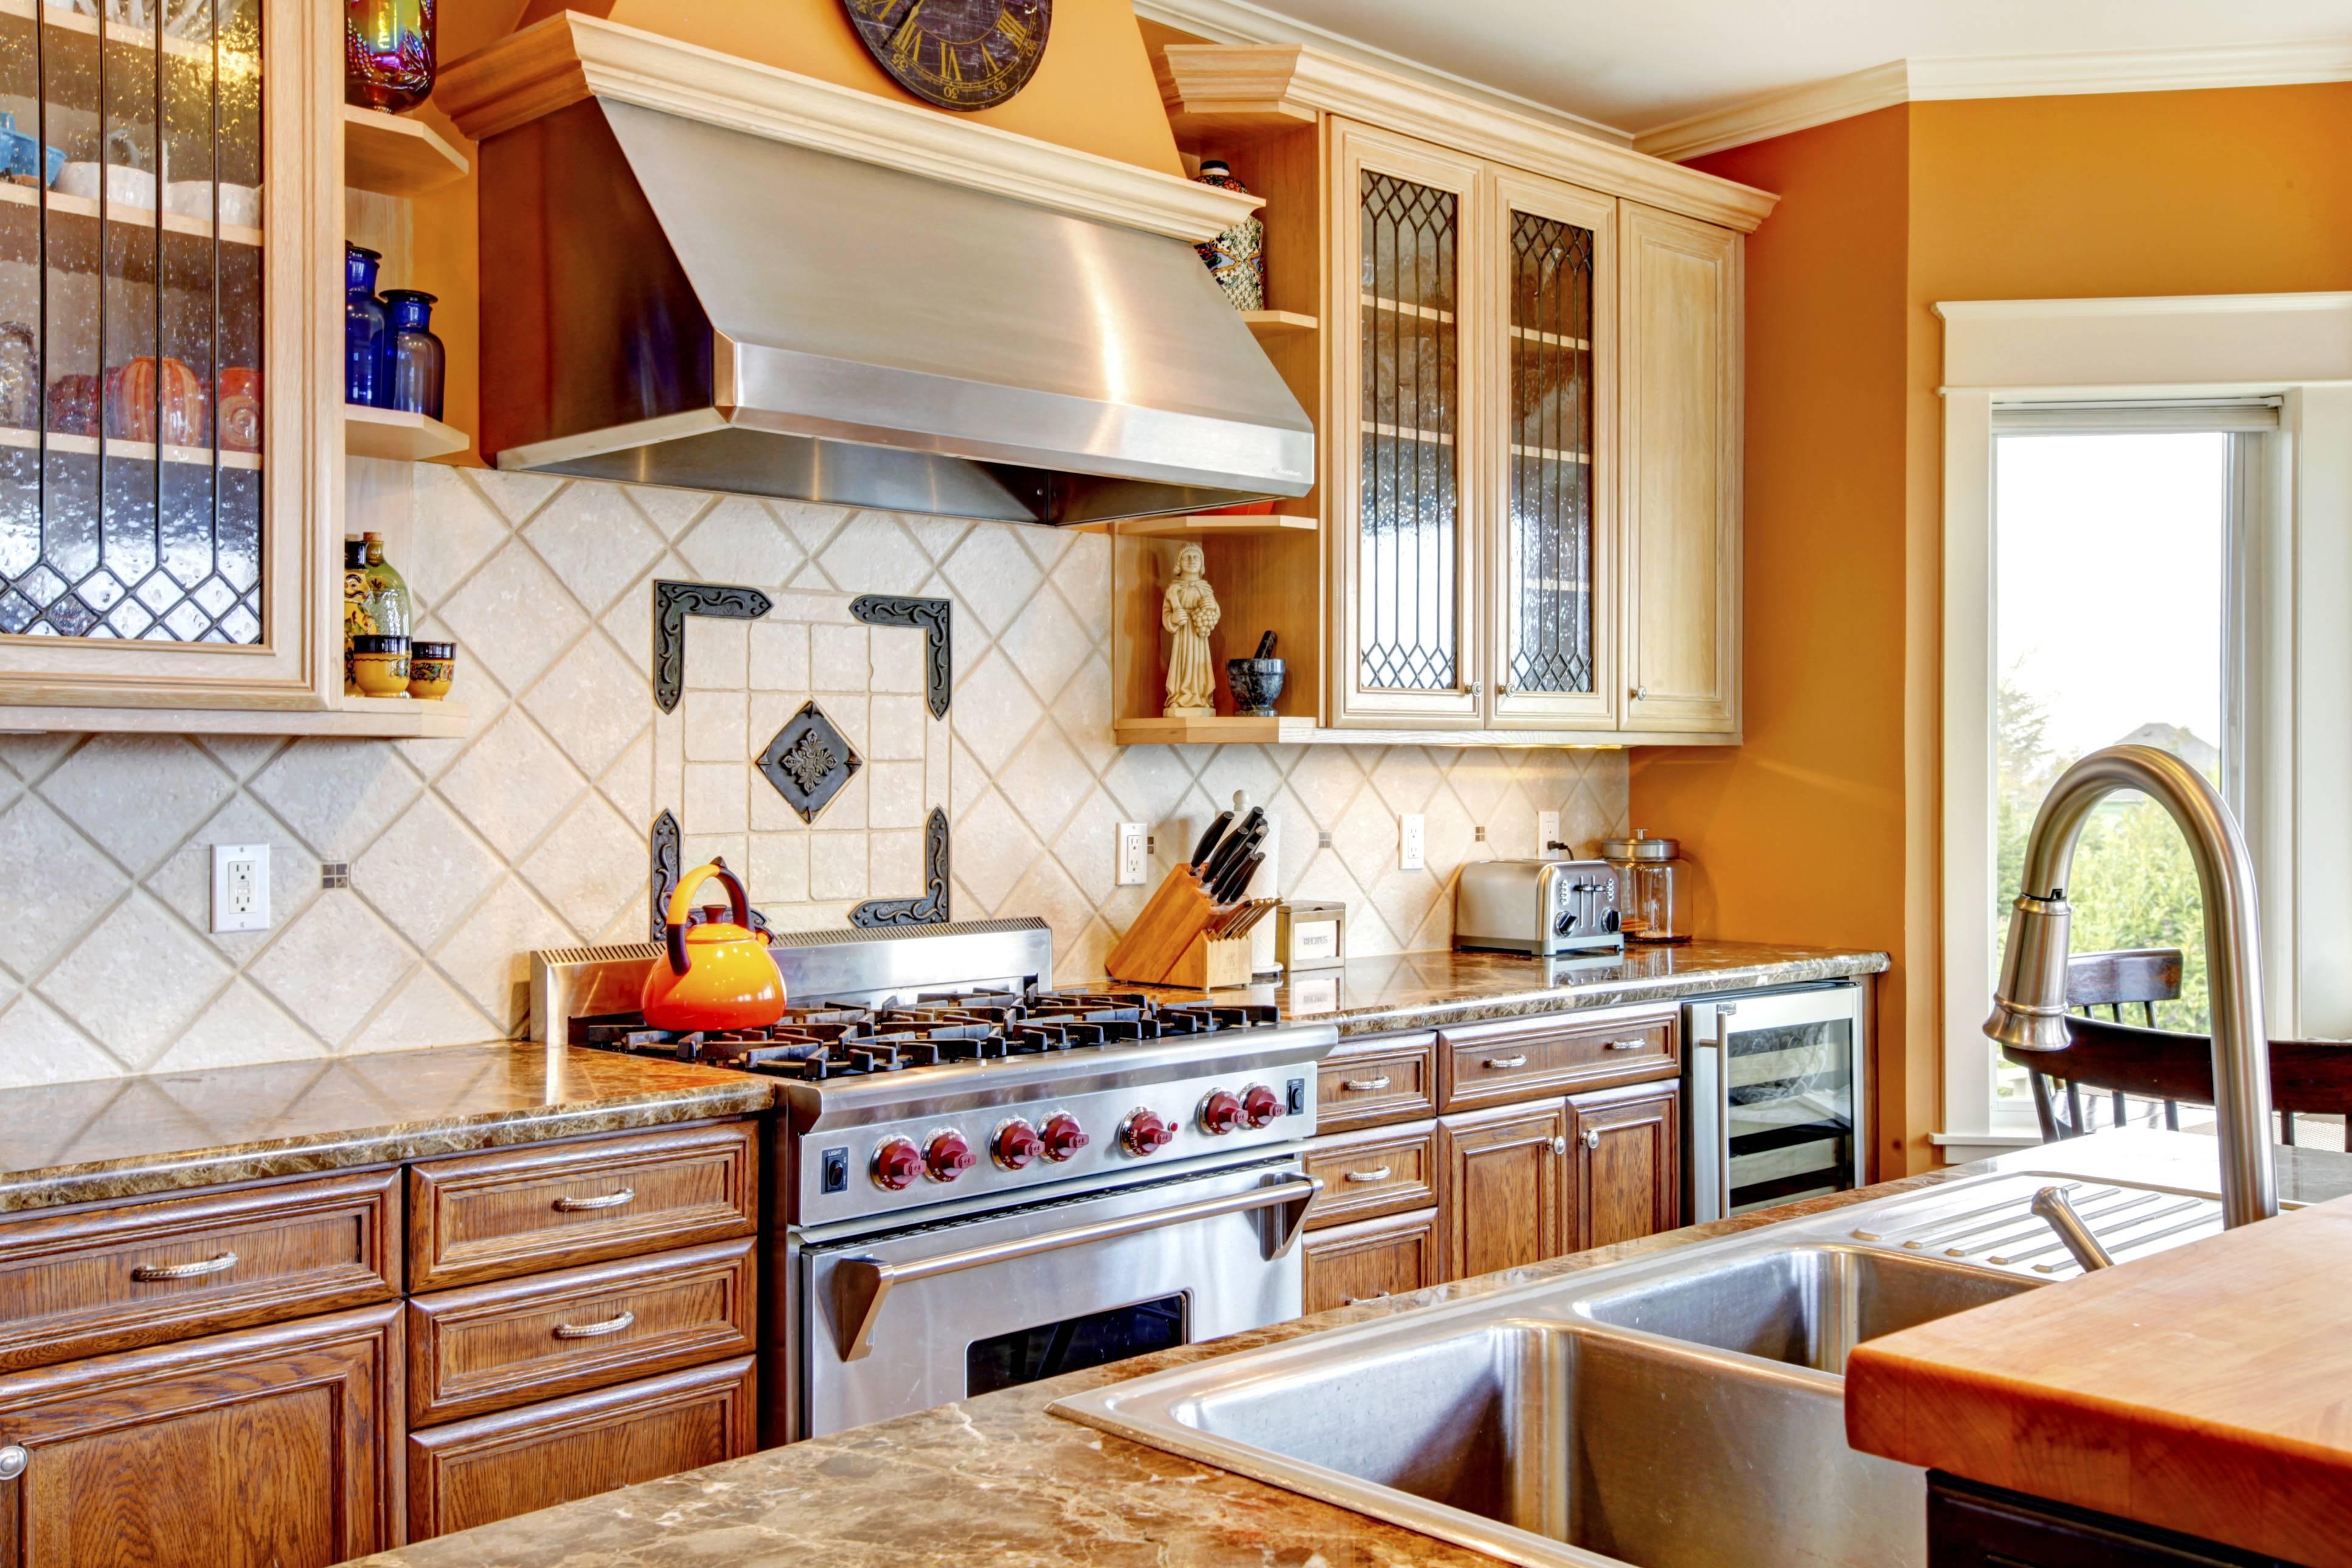 kitchen interior with tile backsplash- traqline home improvement market shares